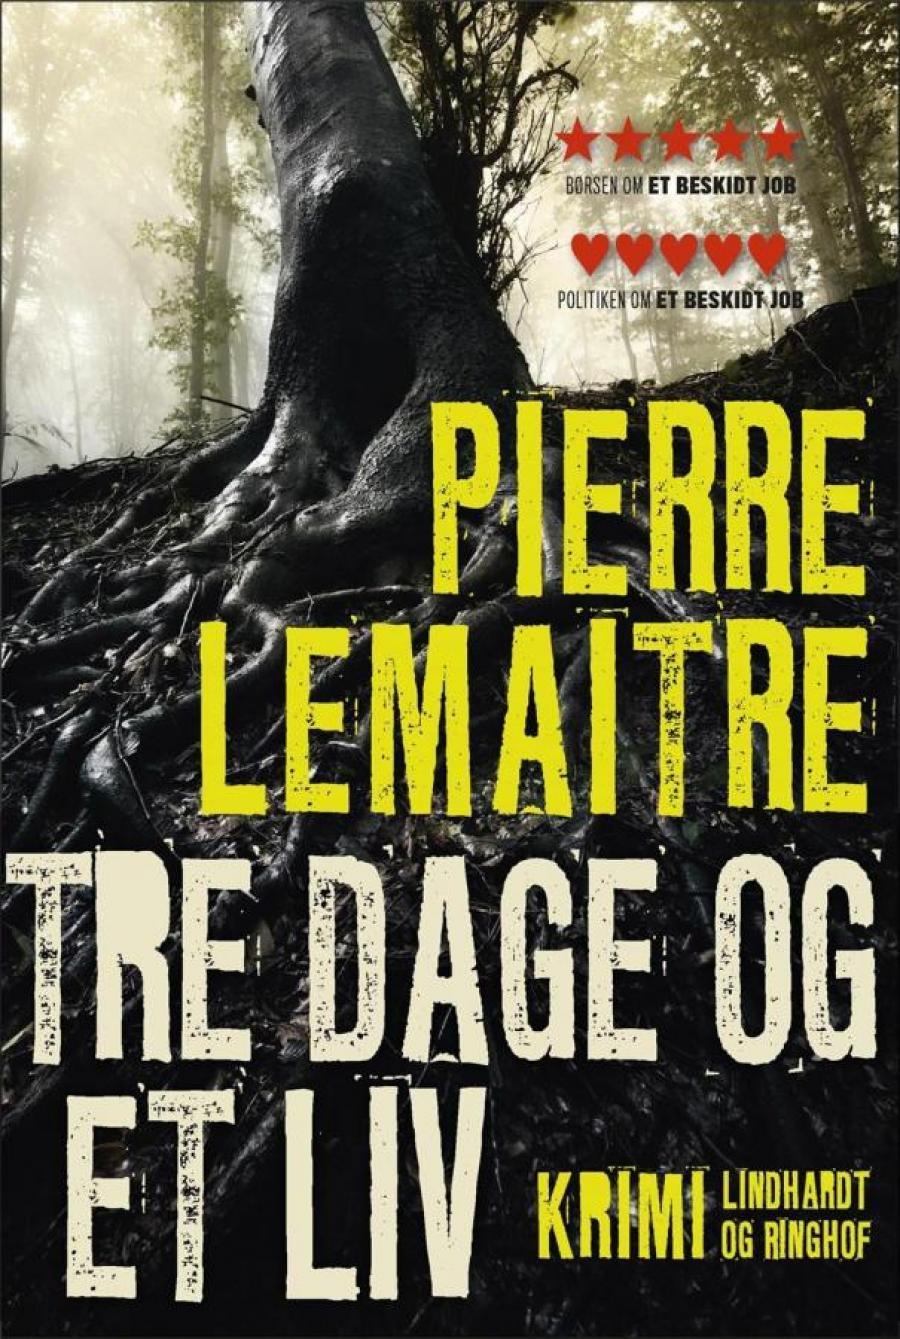 Bente anbefaler Pierre Lematre